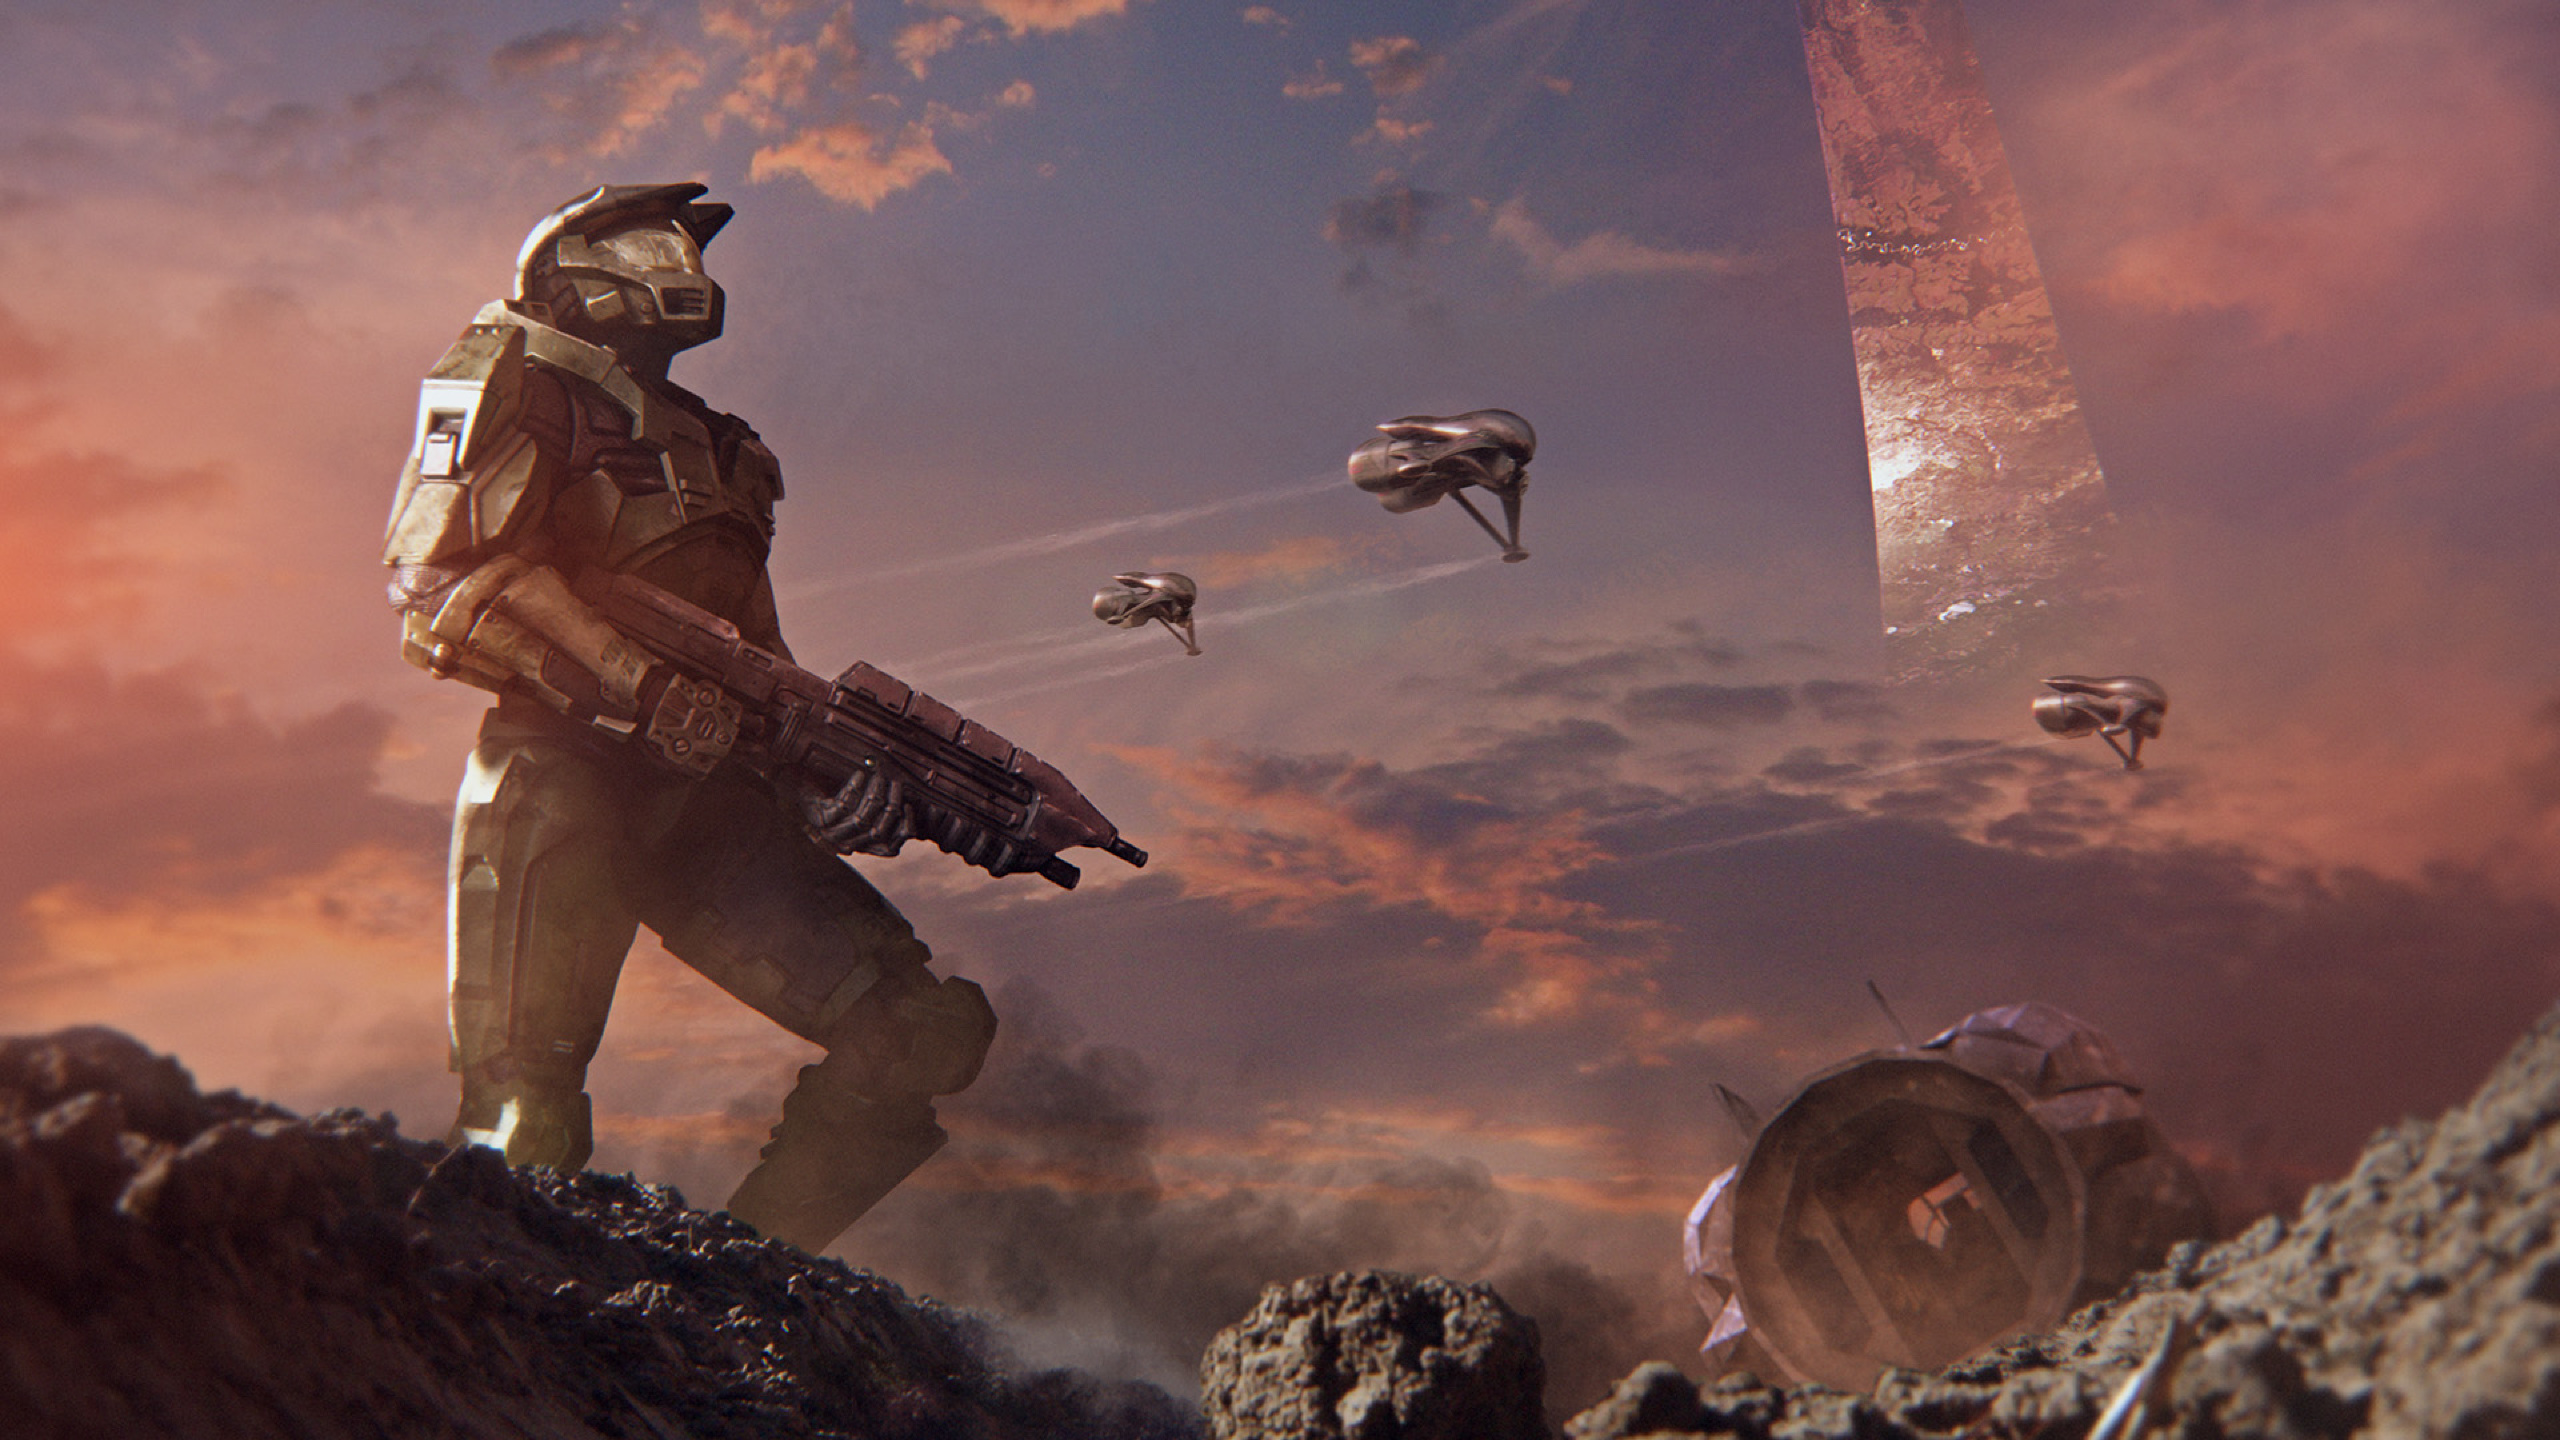 2560x1440 Halo Alpha Battle 1440p Resolution Wallpaper Hd